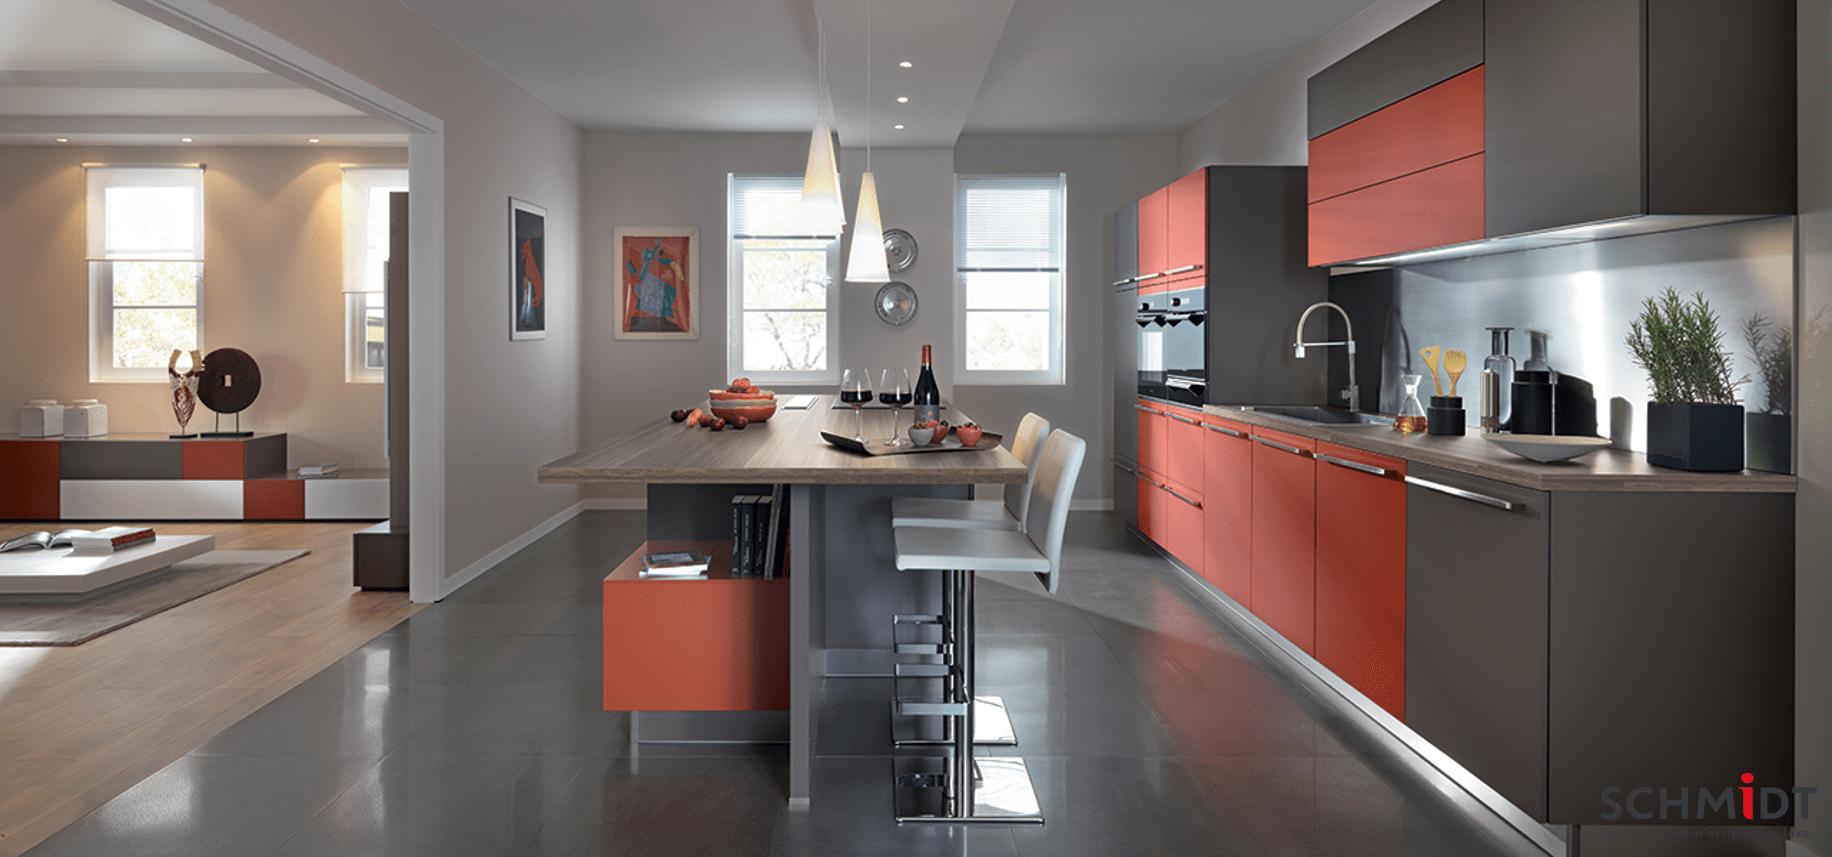 mon foyer cuisinity. Black Bedroom Furniture Sets. Home Design Ideas